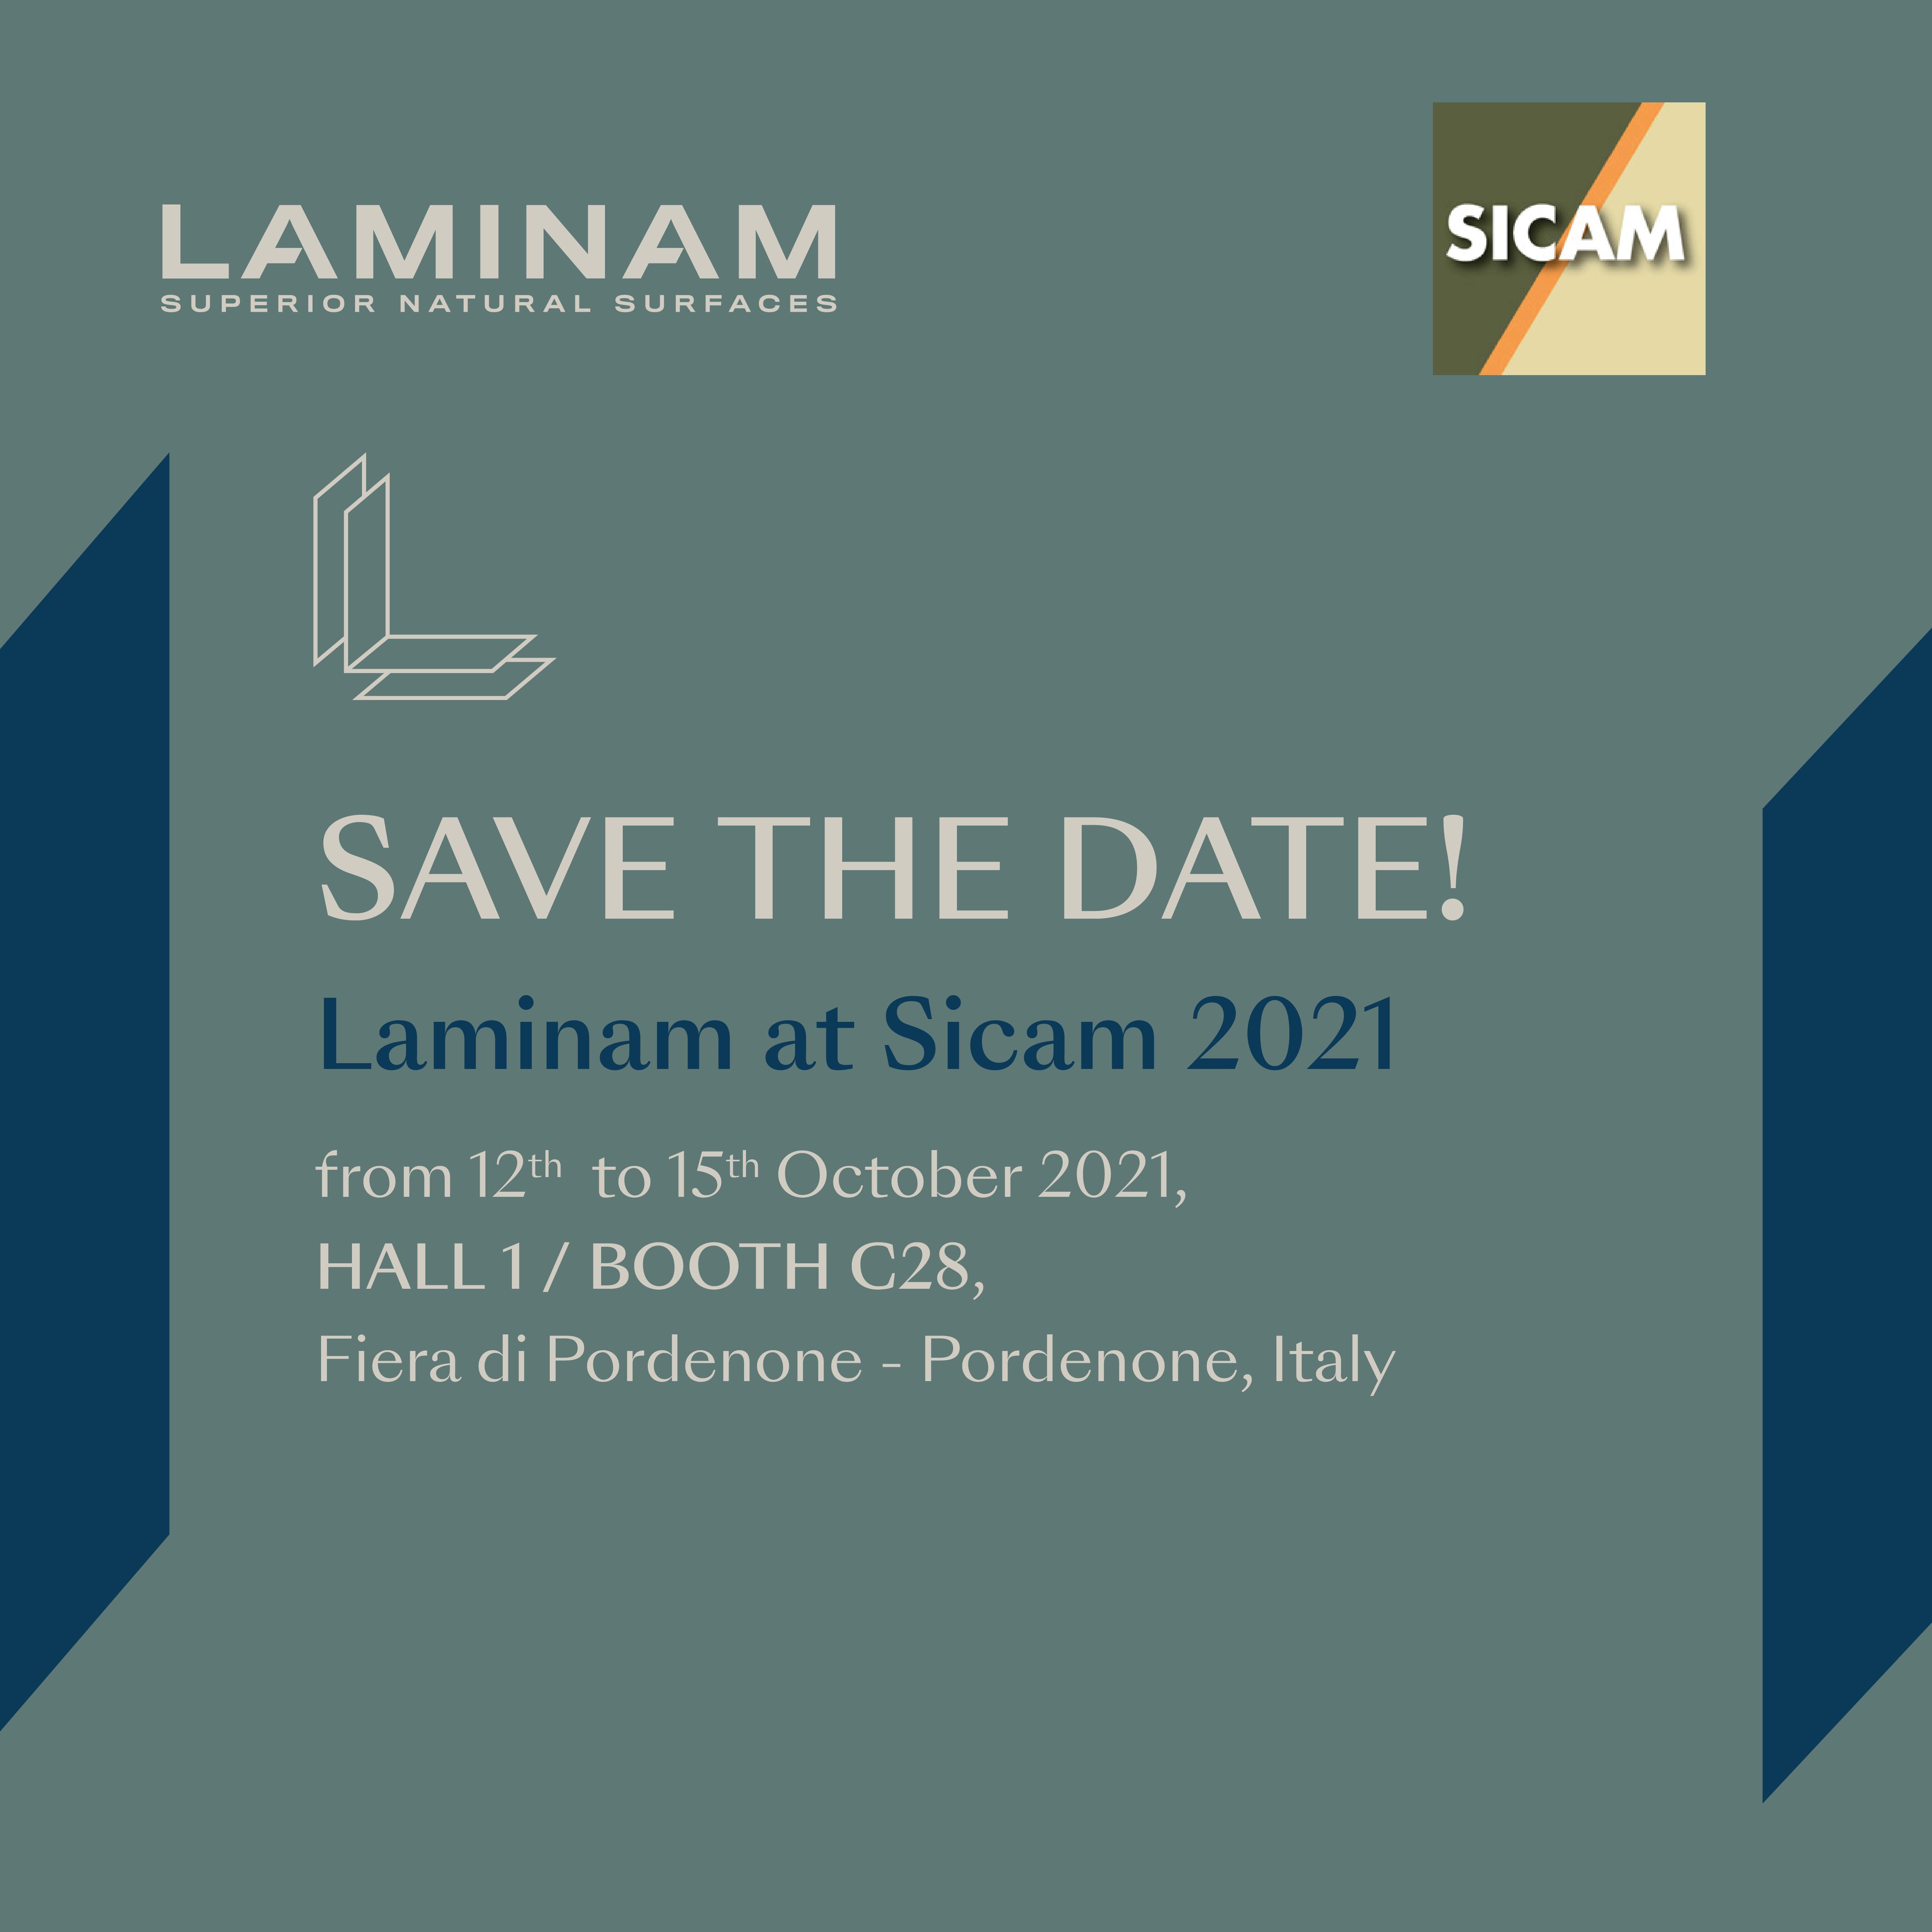 Laminam at Sicam 2021